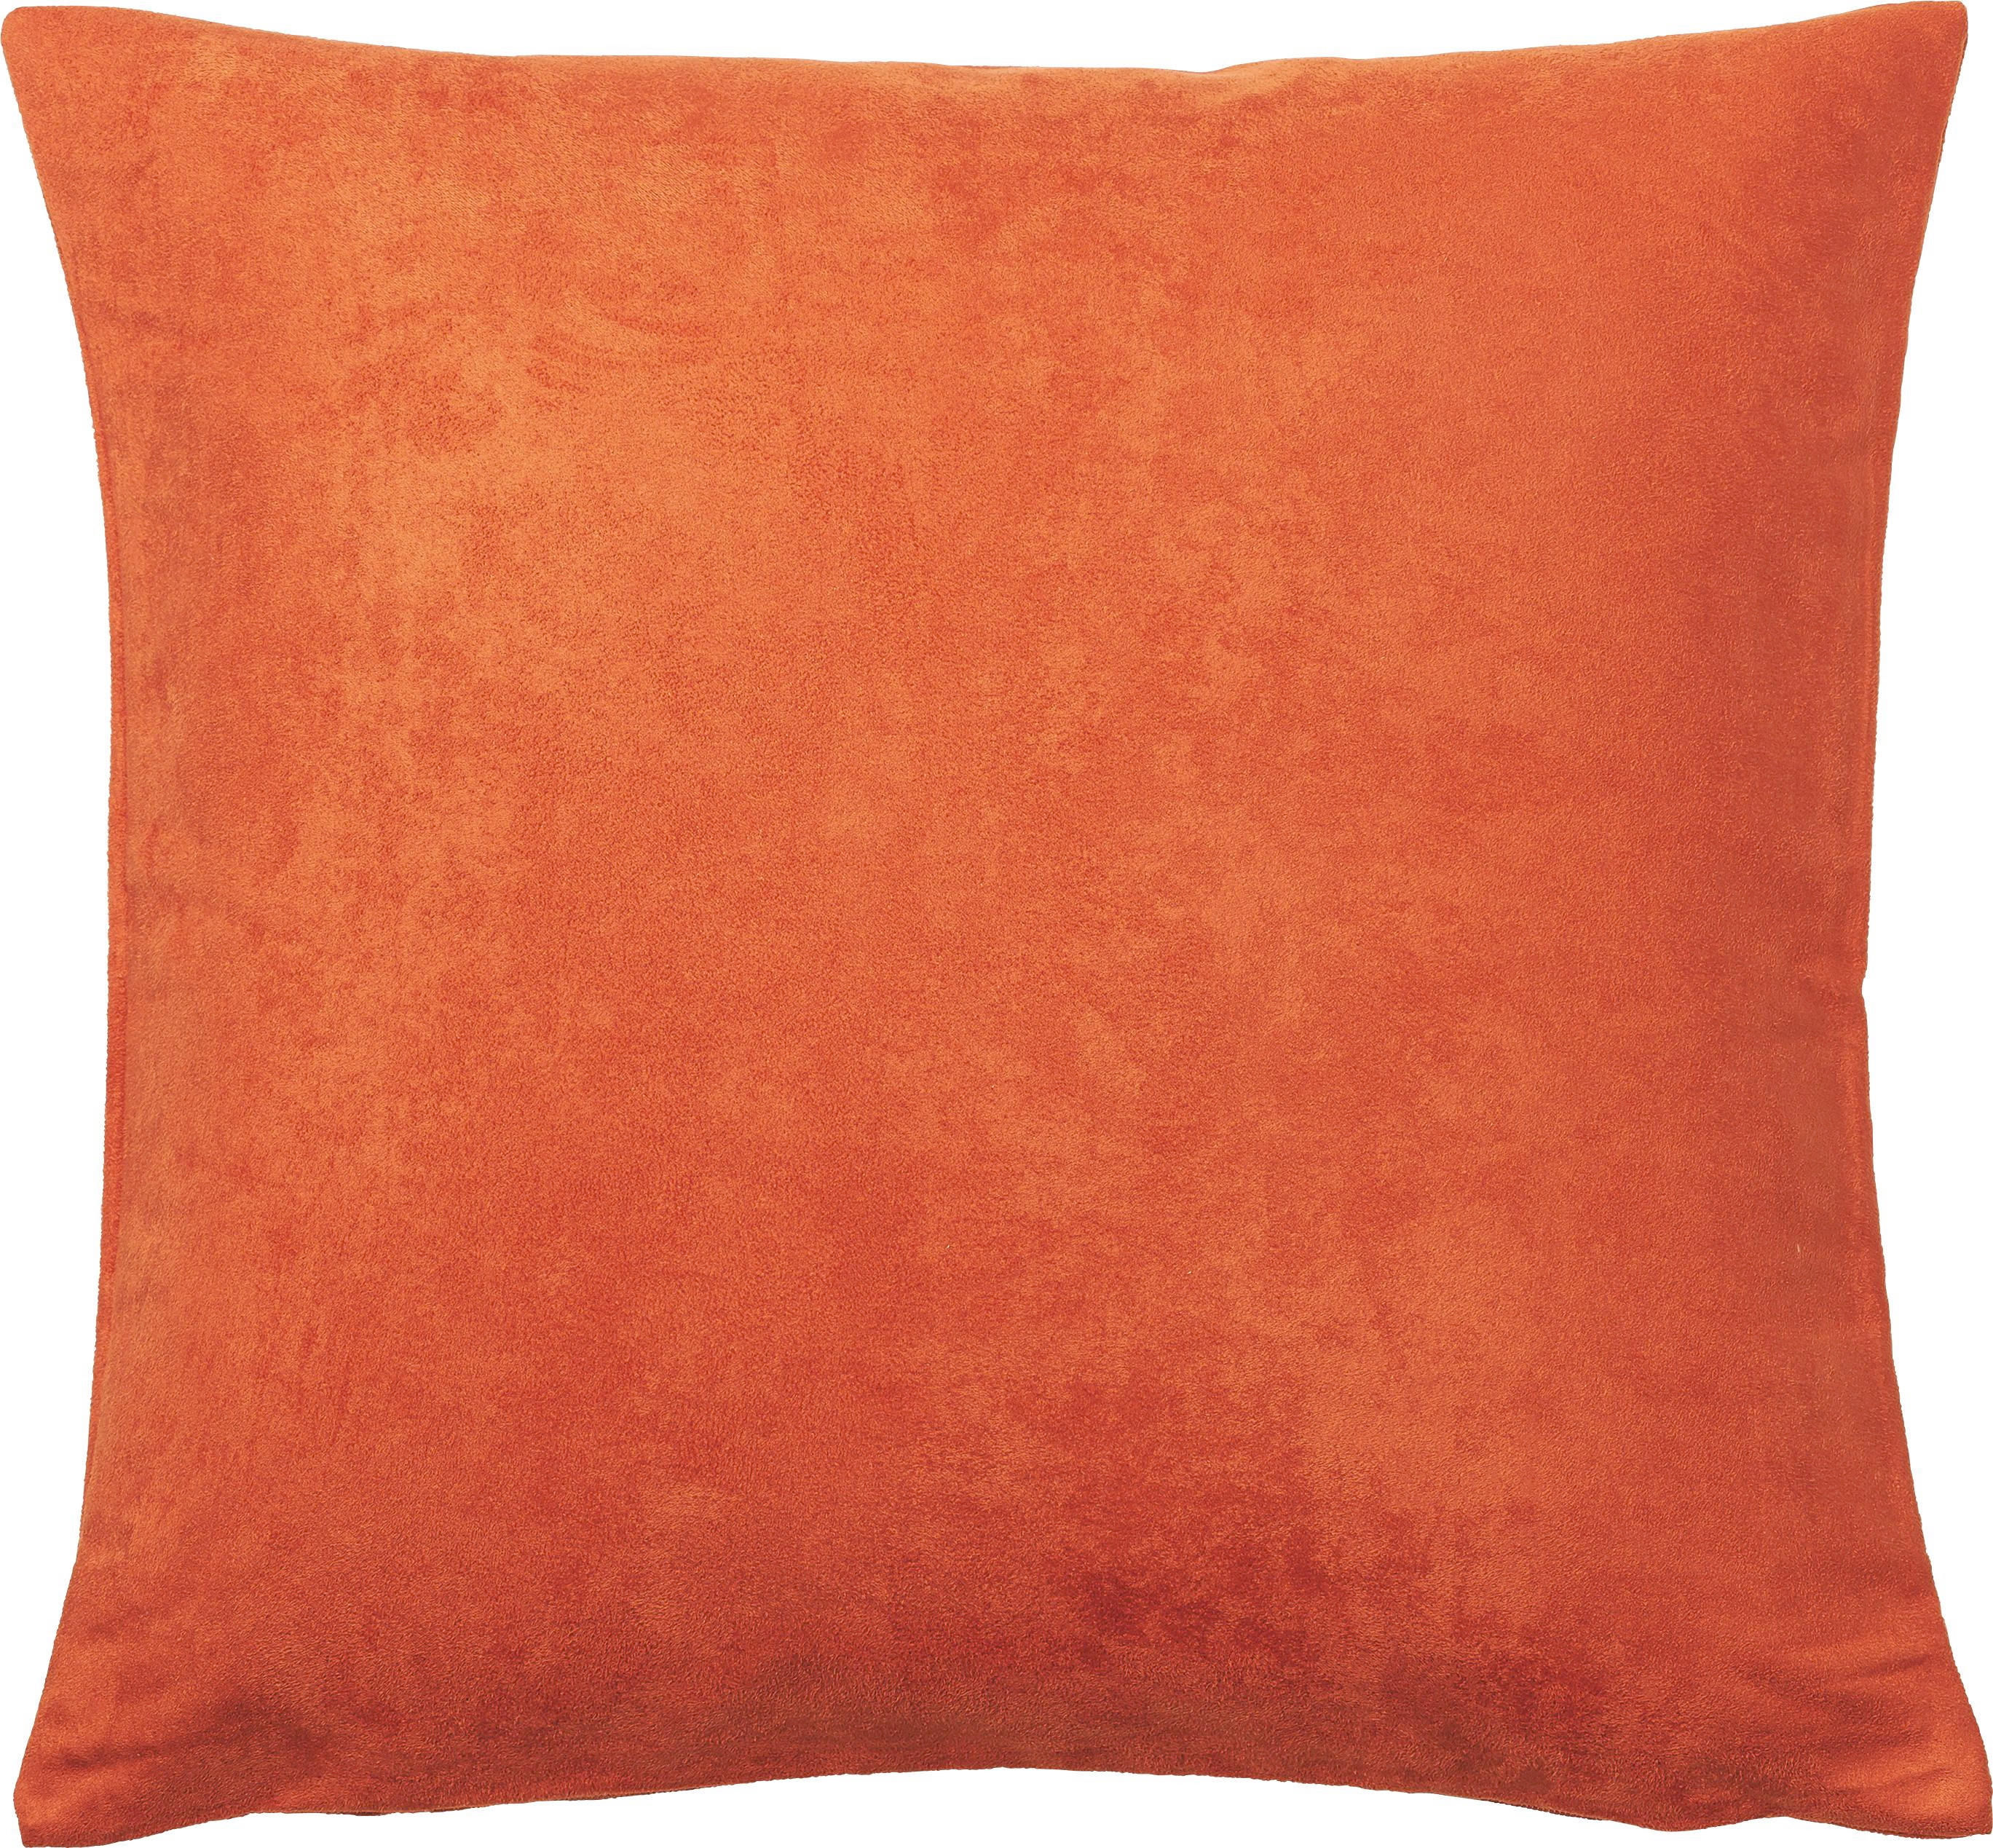 KISSENHÜLLE Orange 50/50 cm - Orange, Basics, Textil (50/50cm) - NOVEL